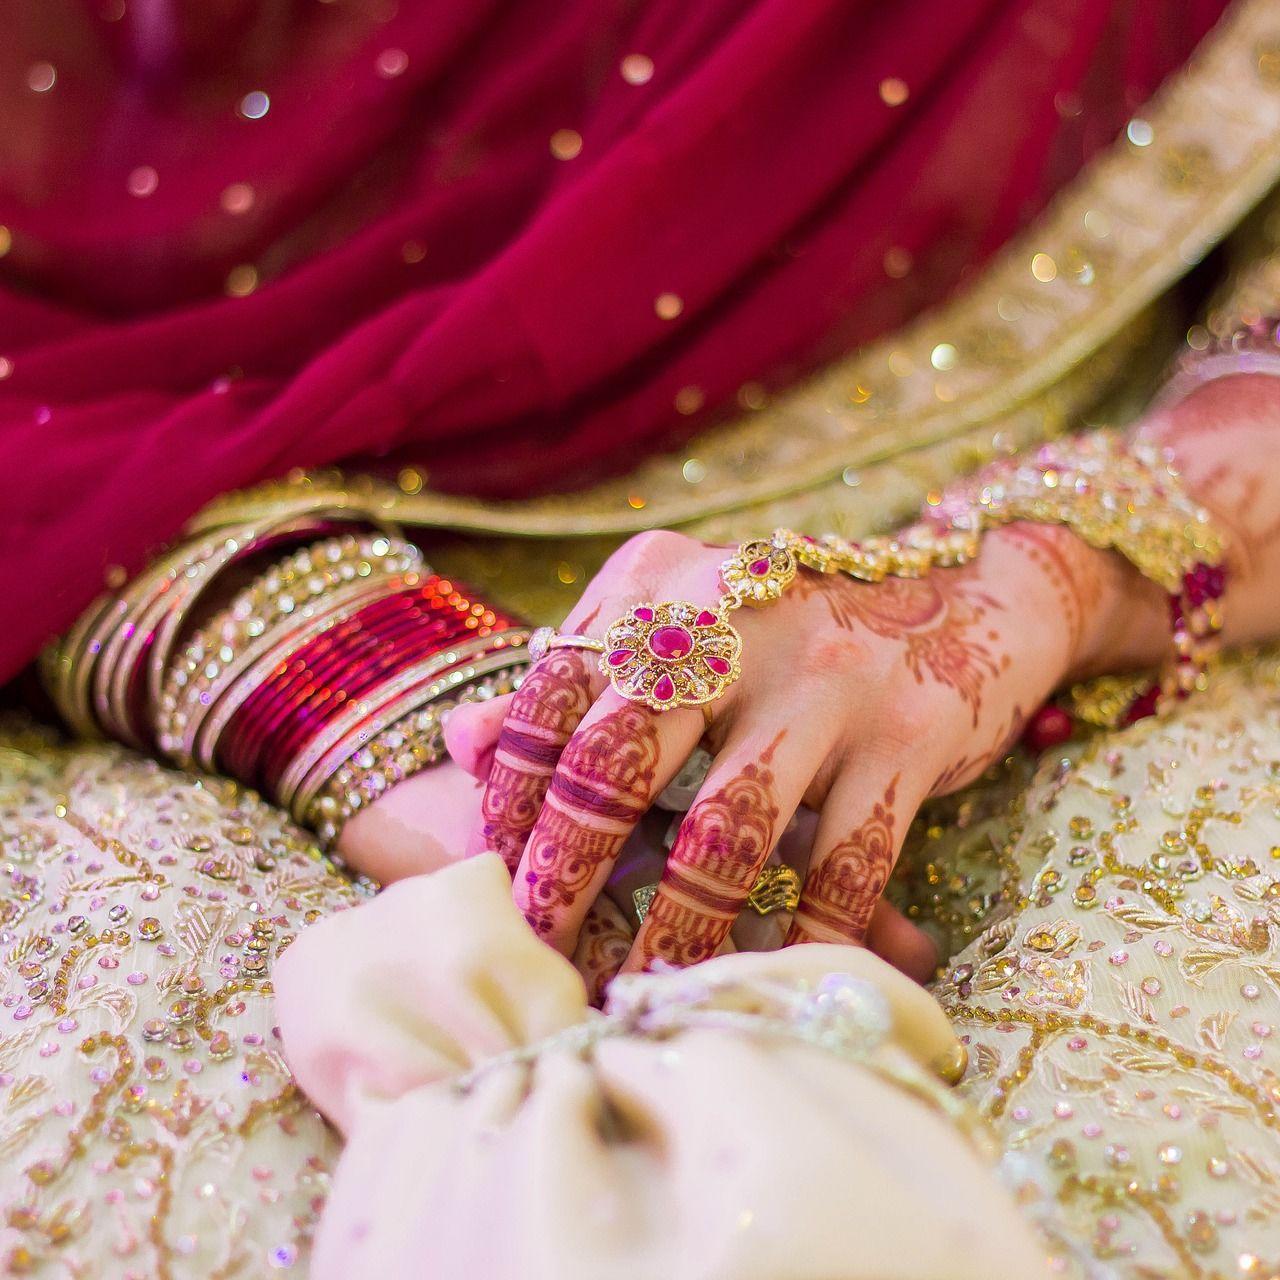 wedding-3952349 1920 1